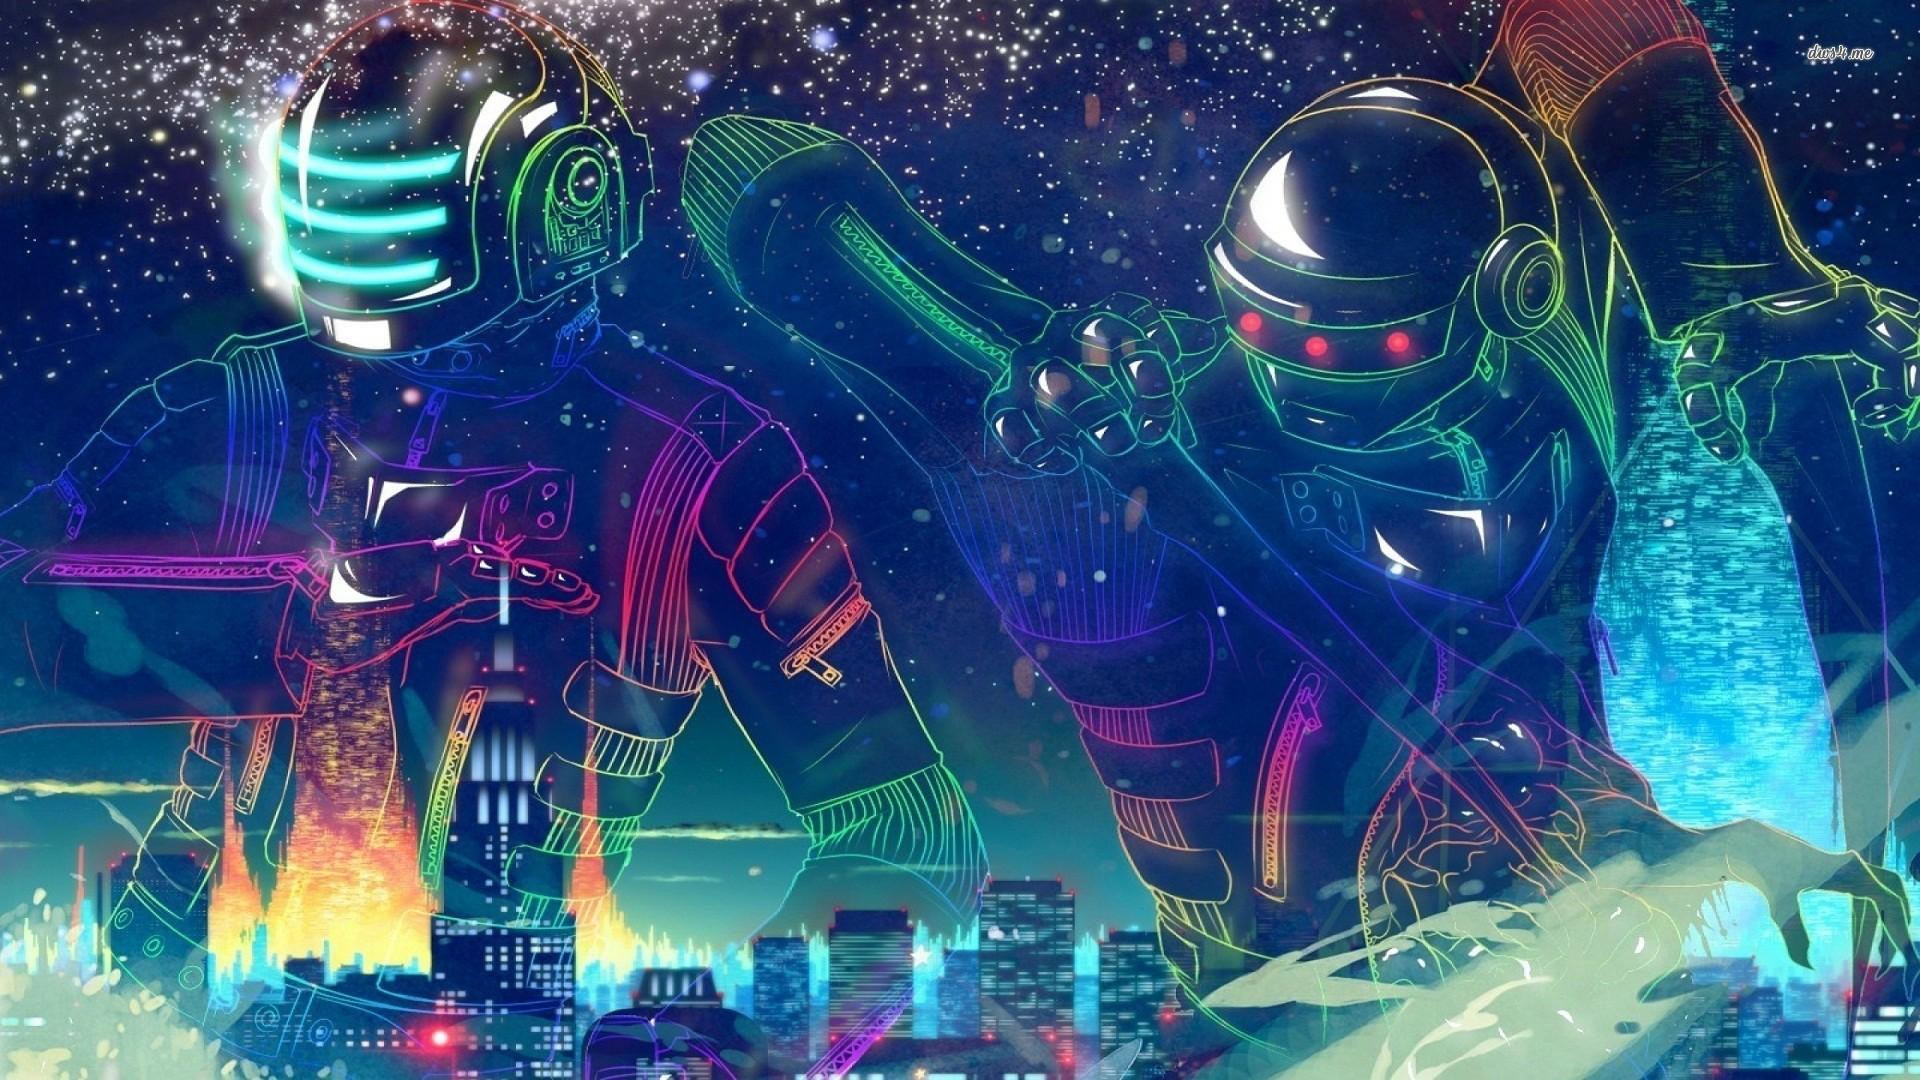 Daft Punk wallpaper photo hd